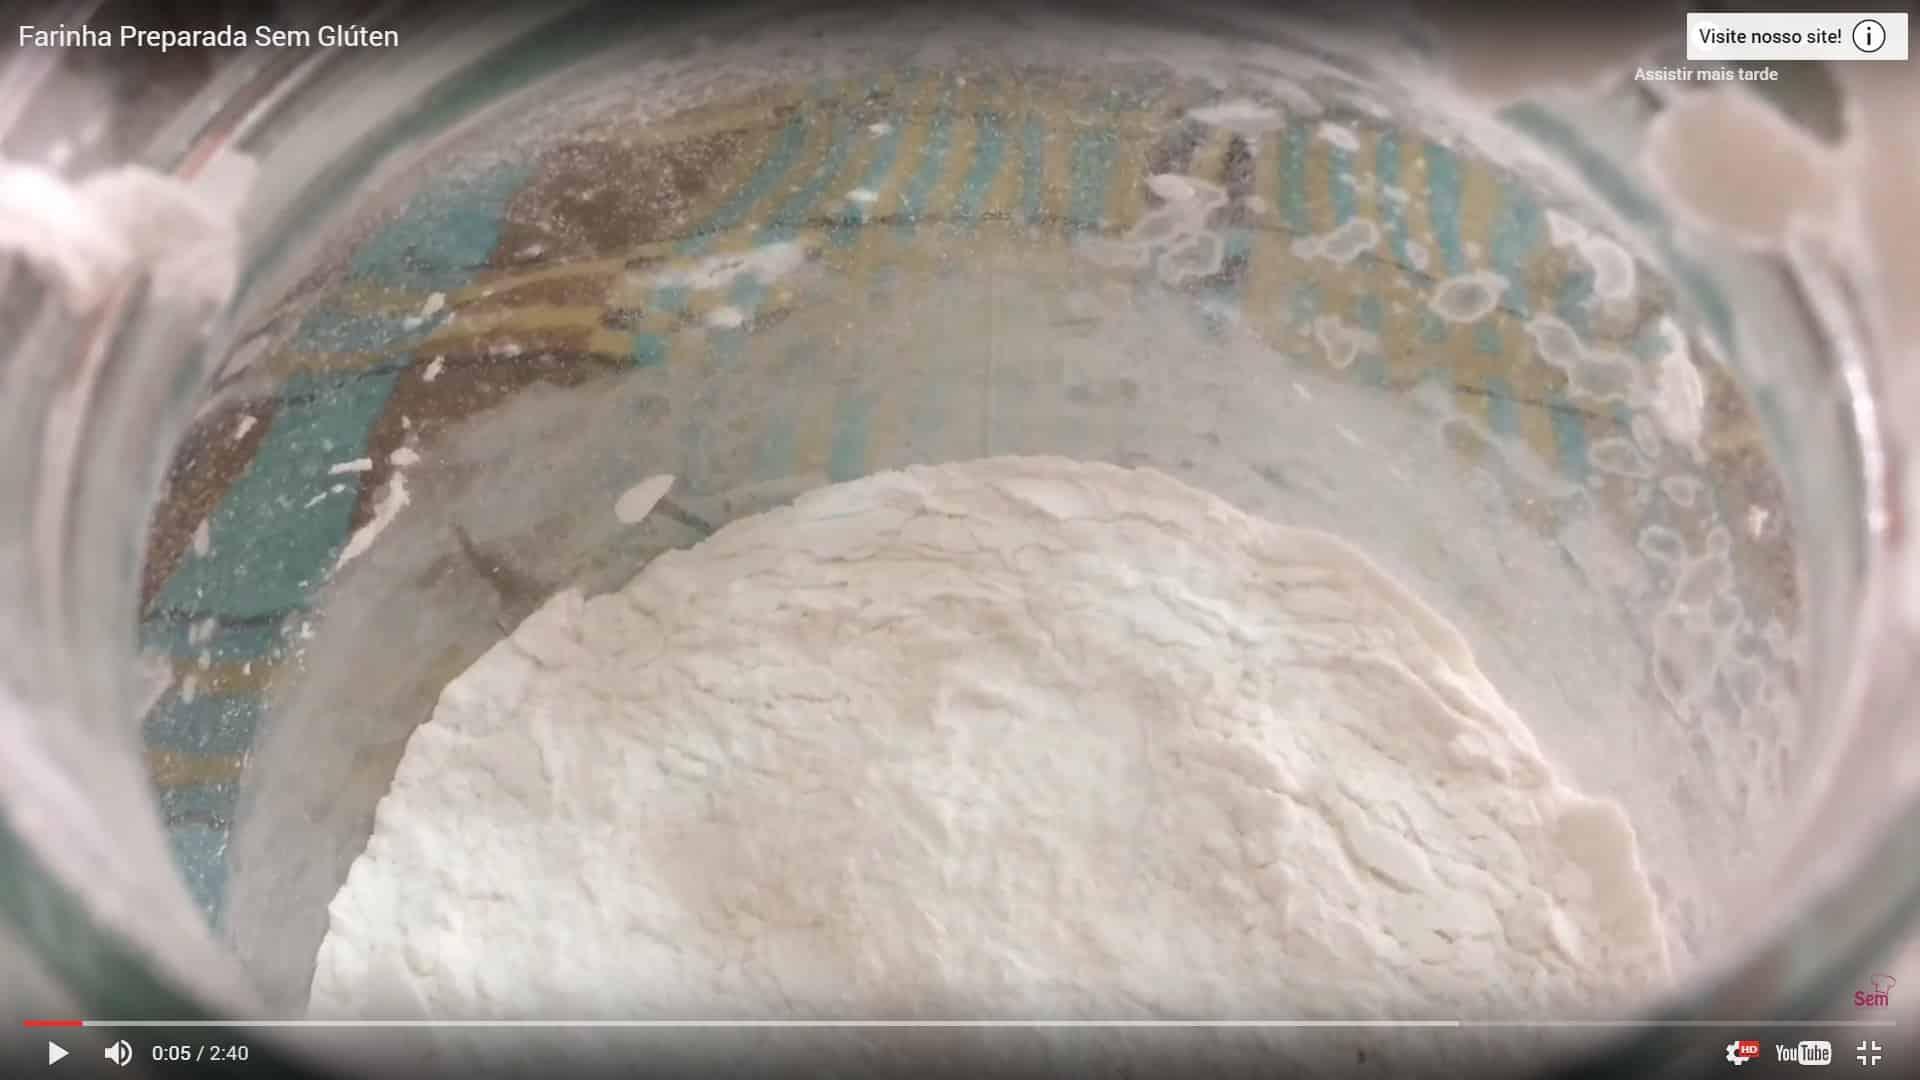 Farinha preparada sem gluten